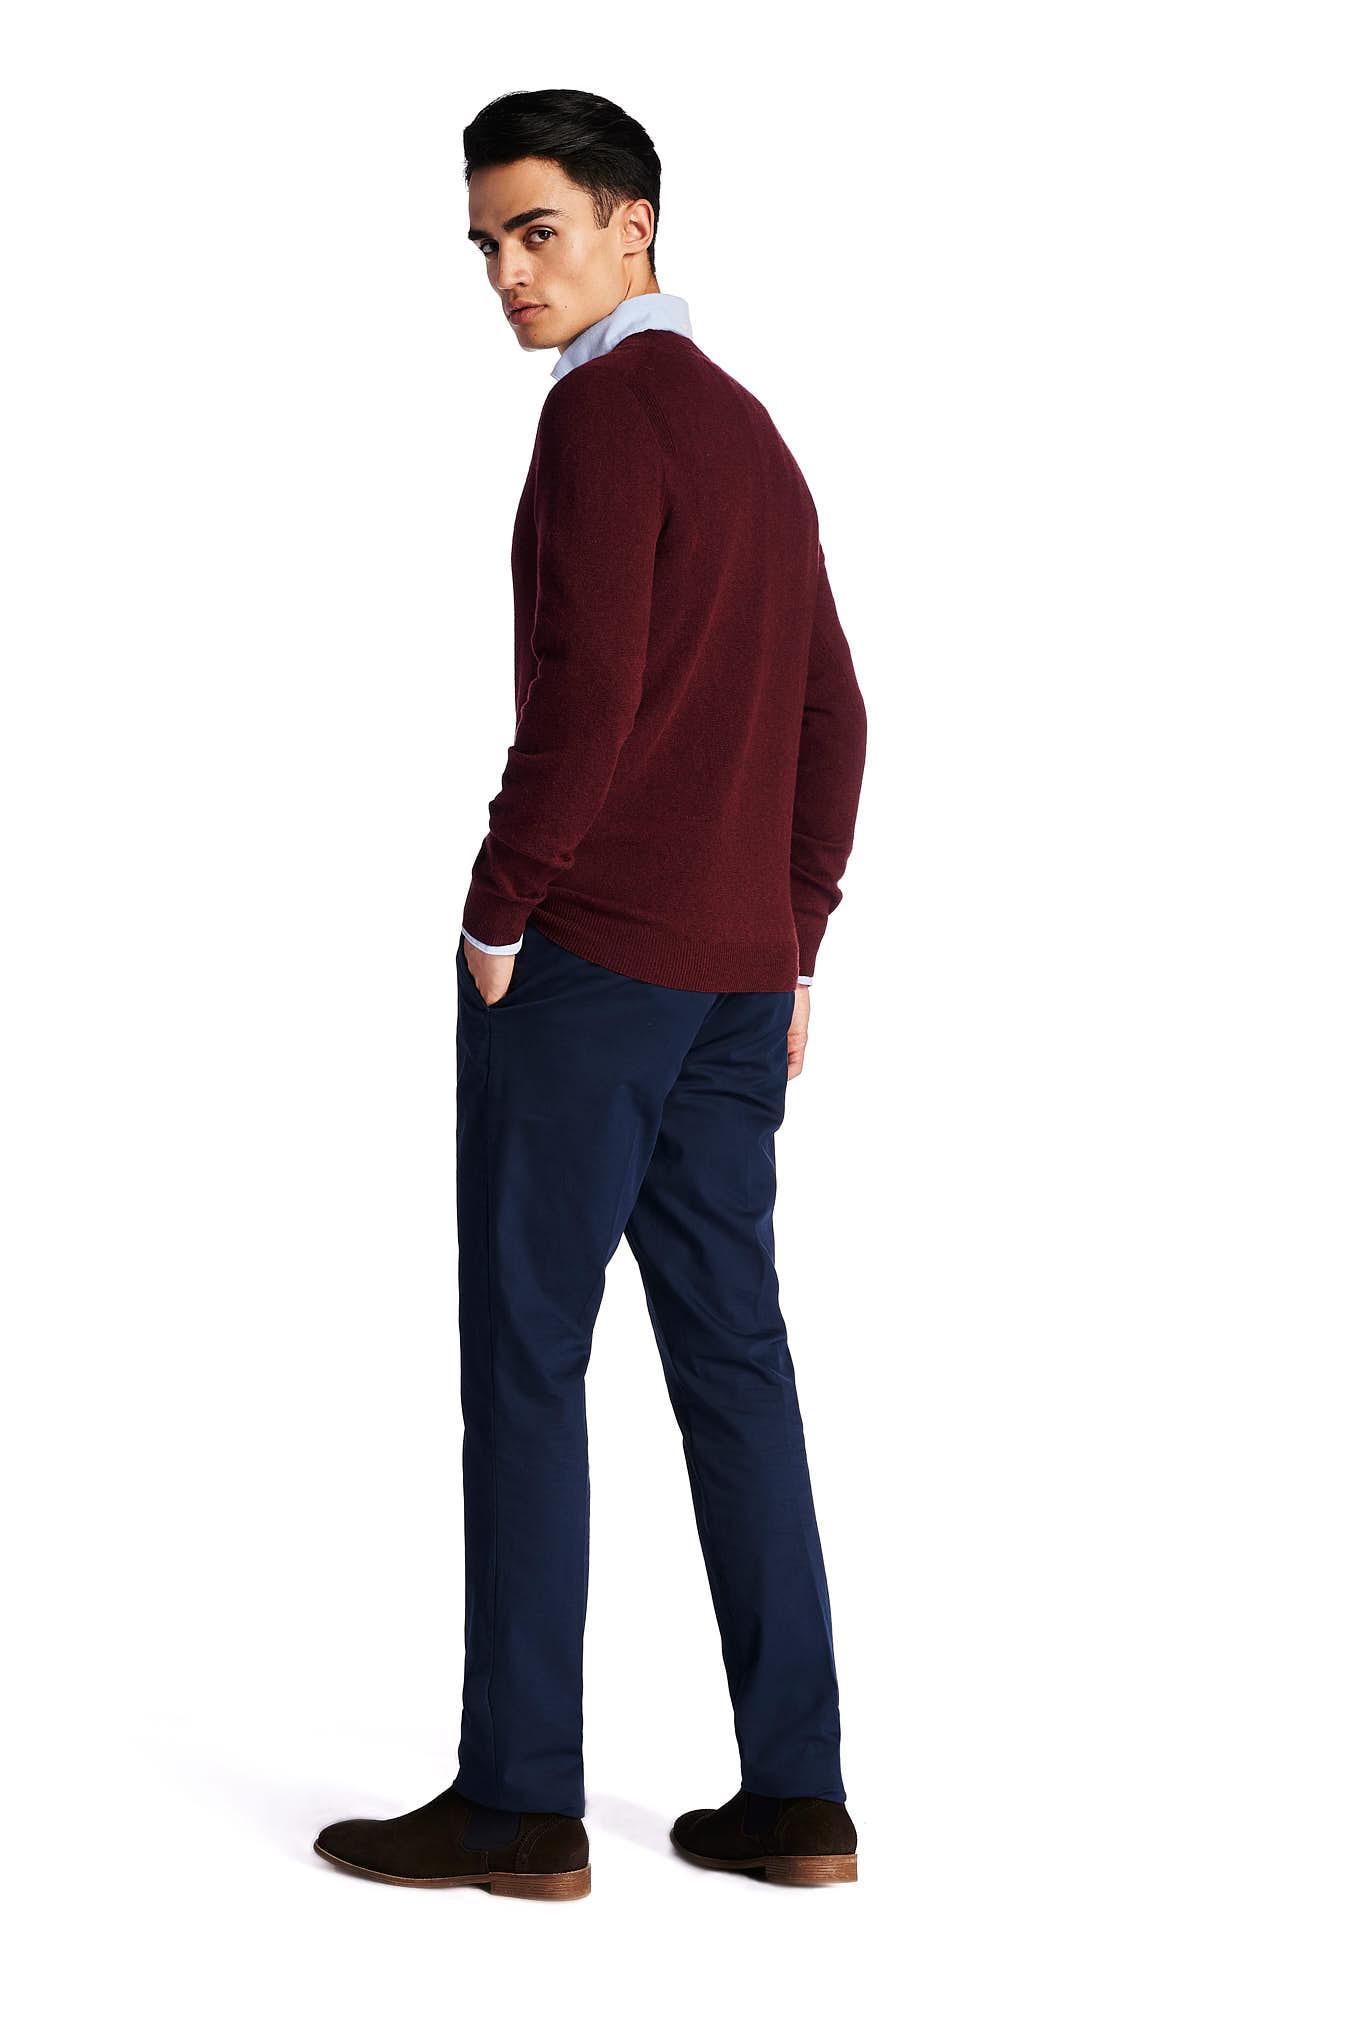 Sweater Bordeaux Casual Man